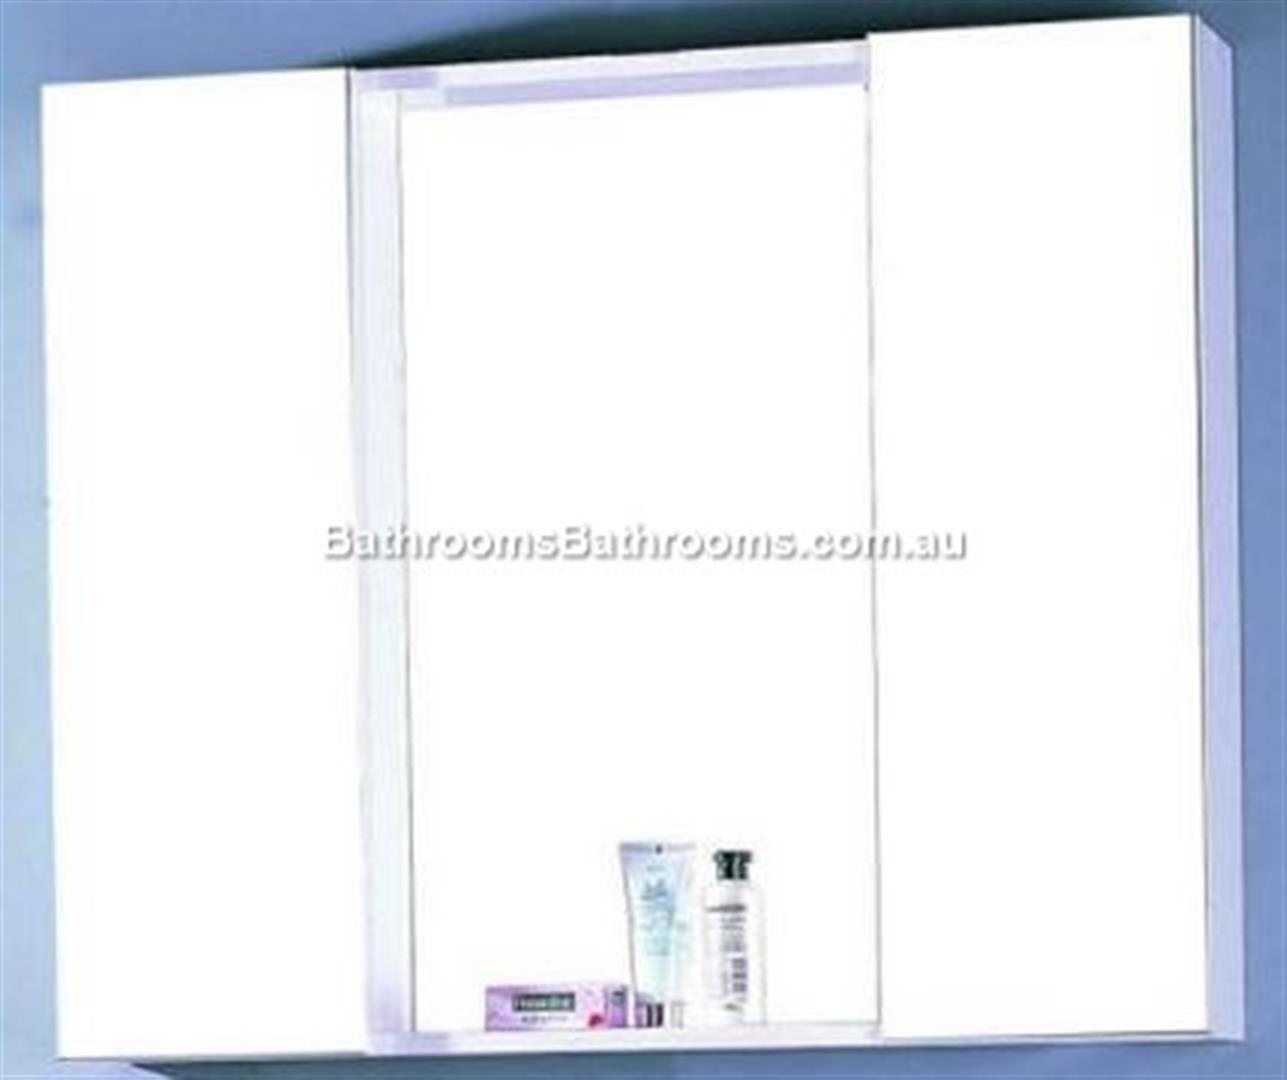 mirror cabinet shaving medicine bathroom 900wx750hx150d new wall hung